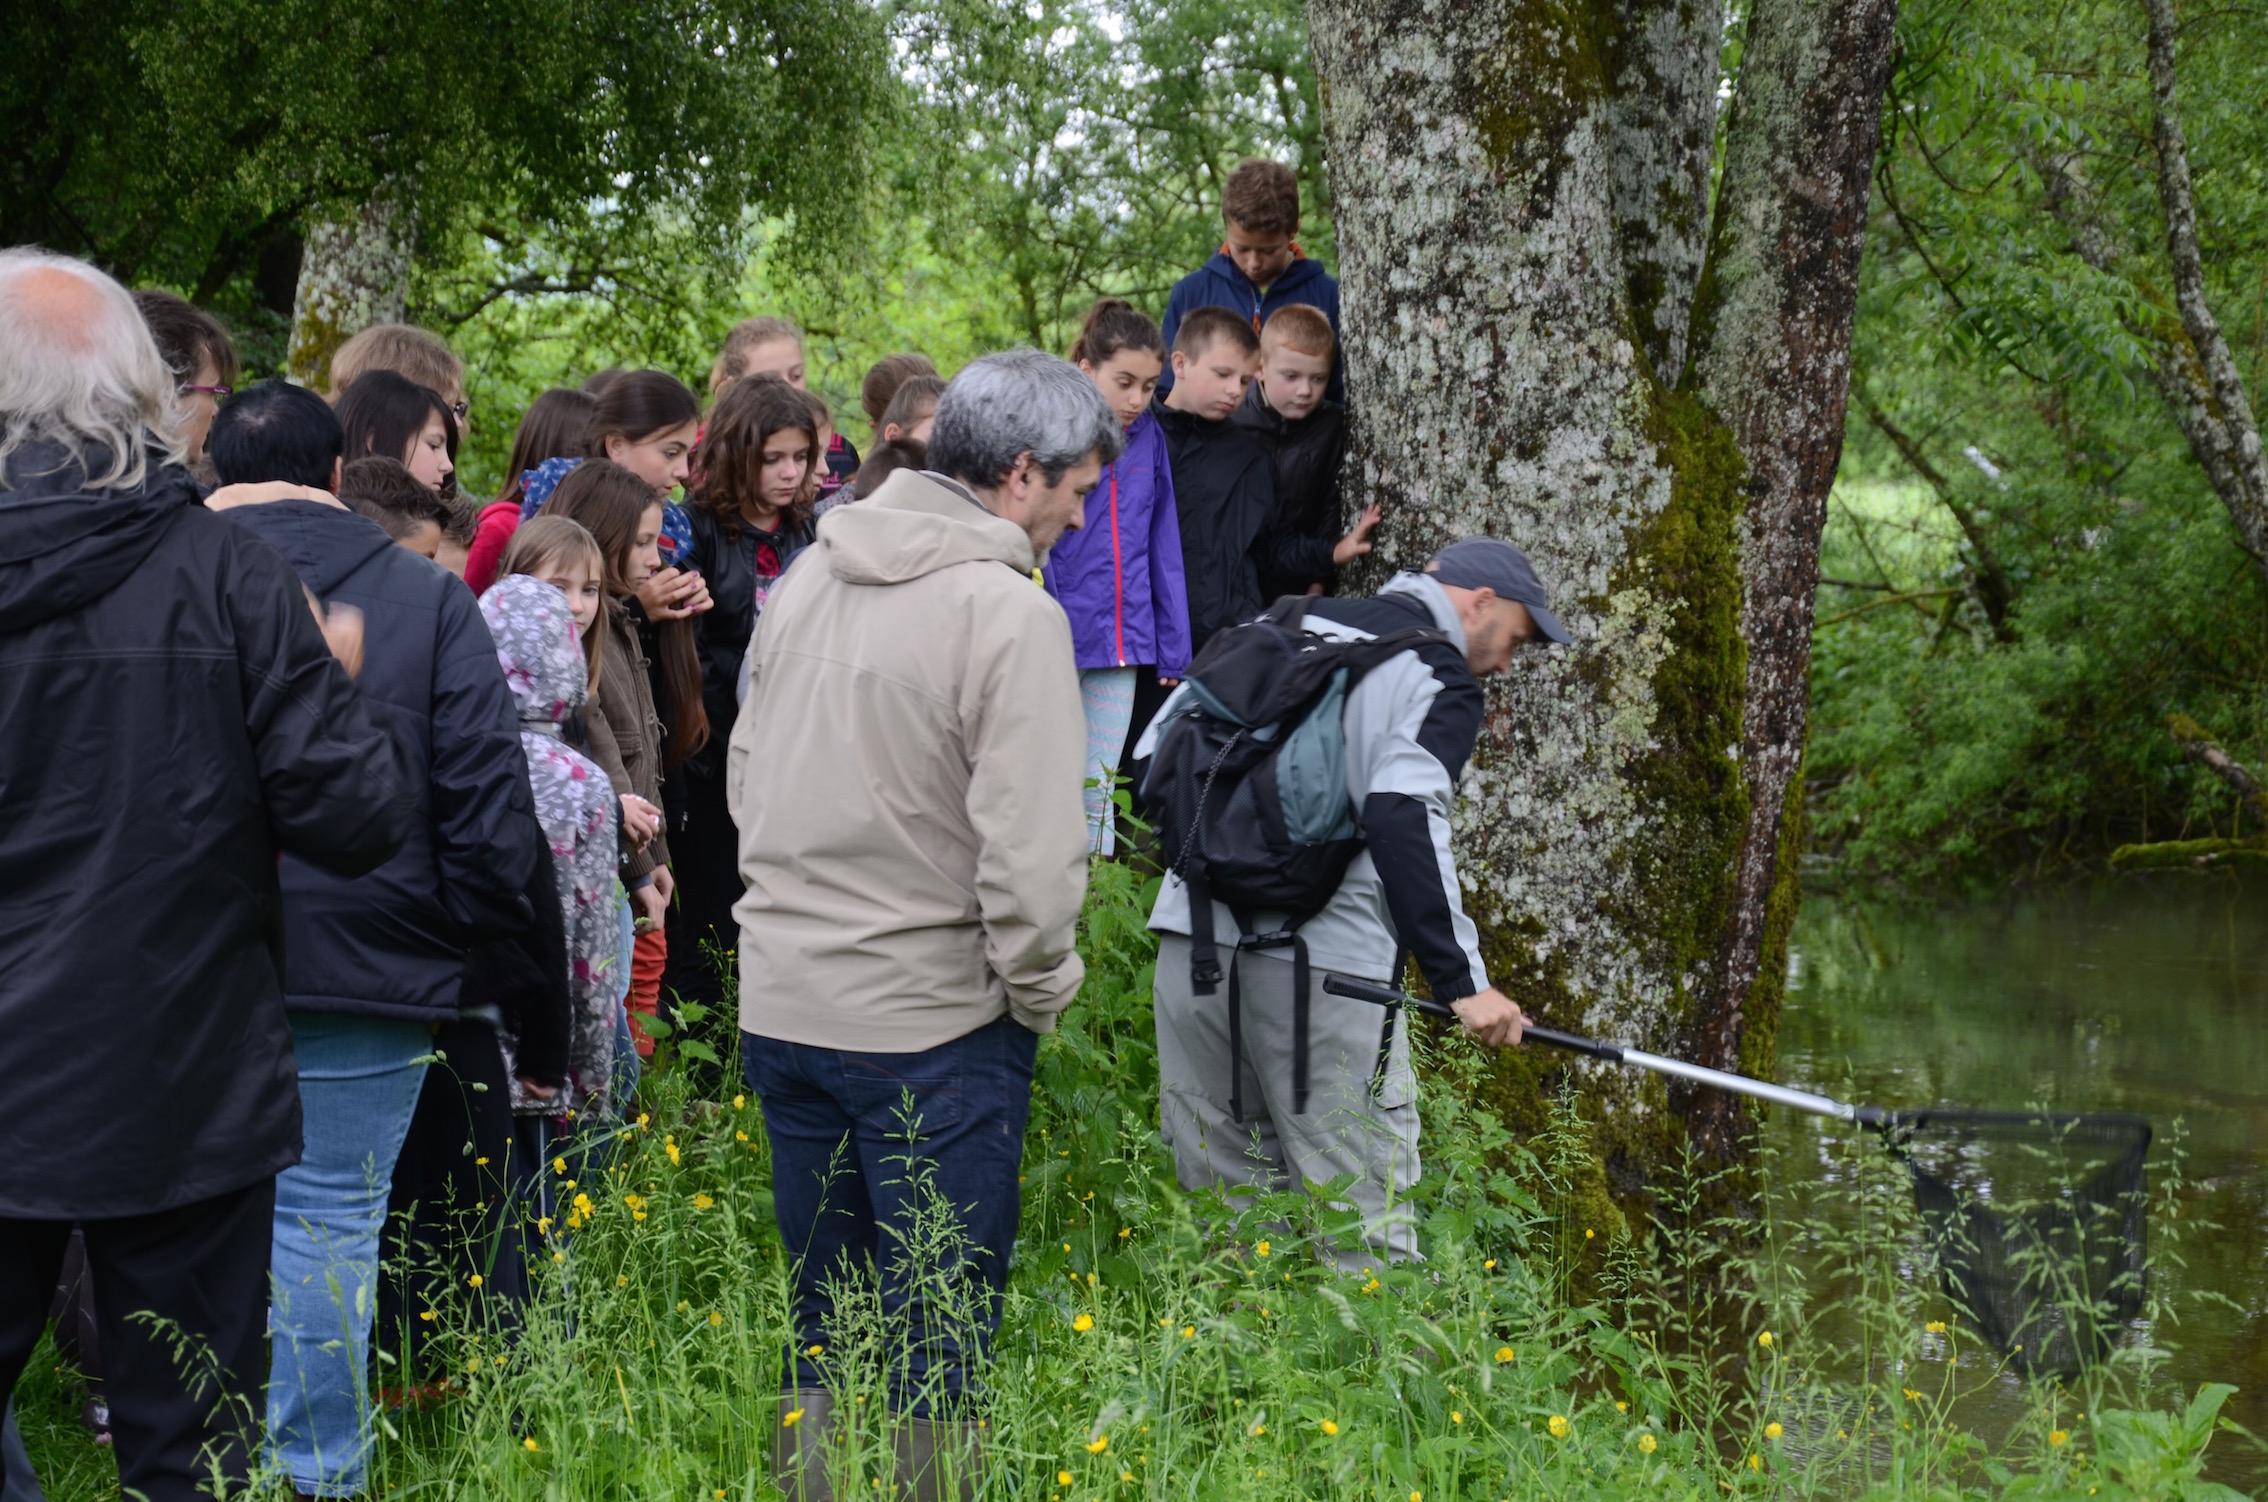 visite-marais-des-grands-pres-03-06-16